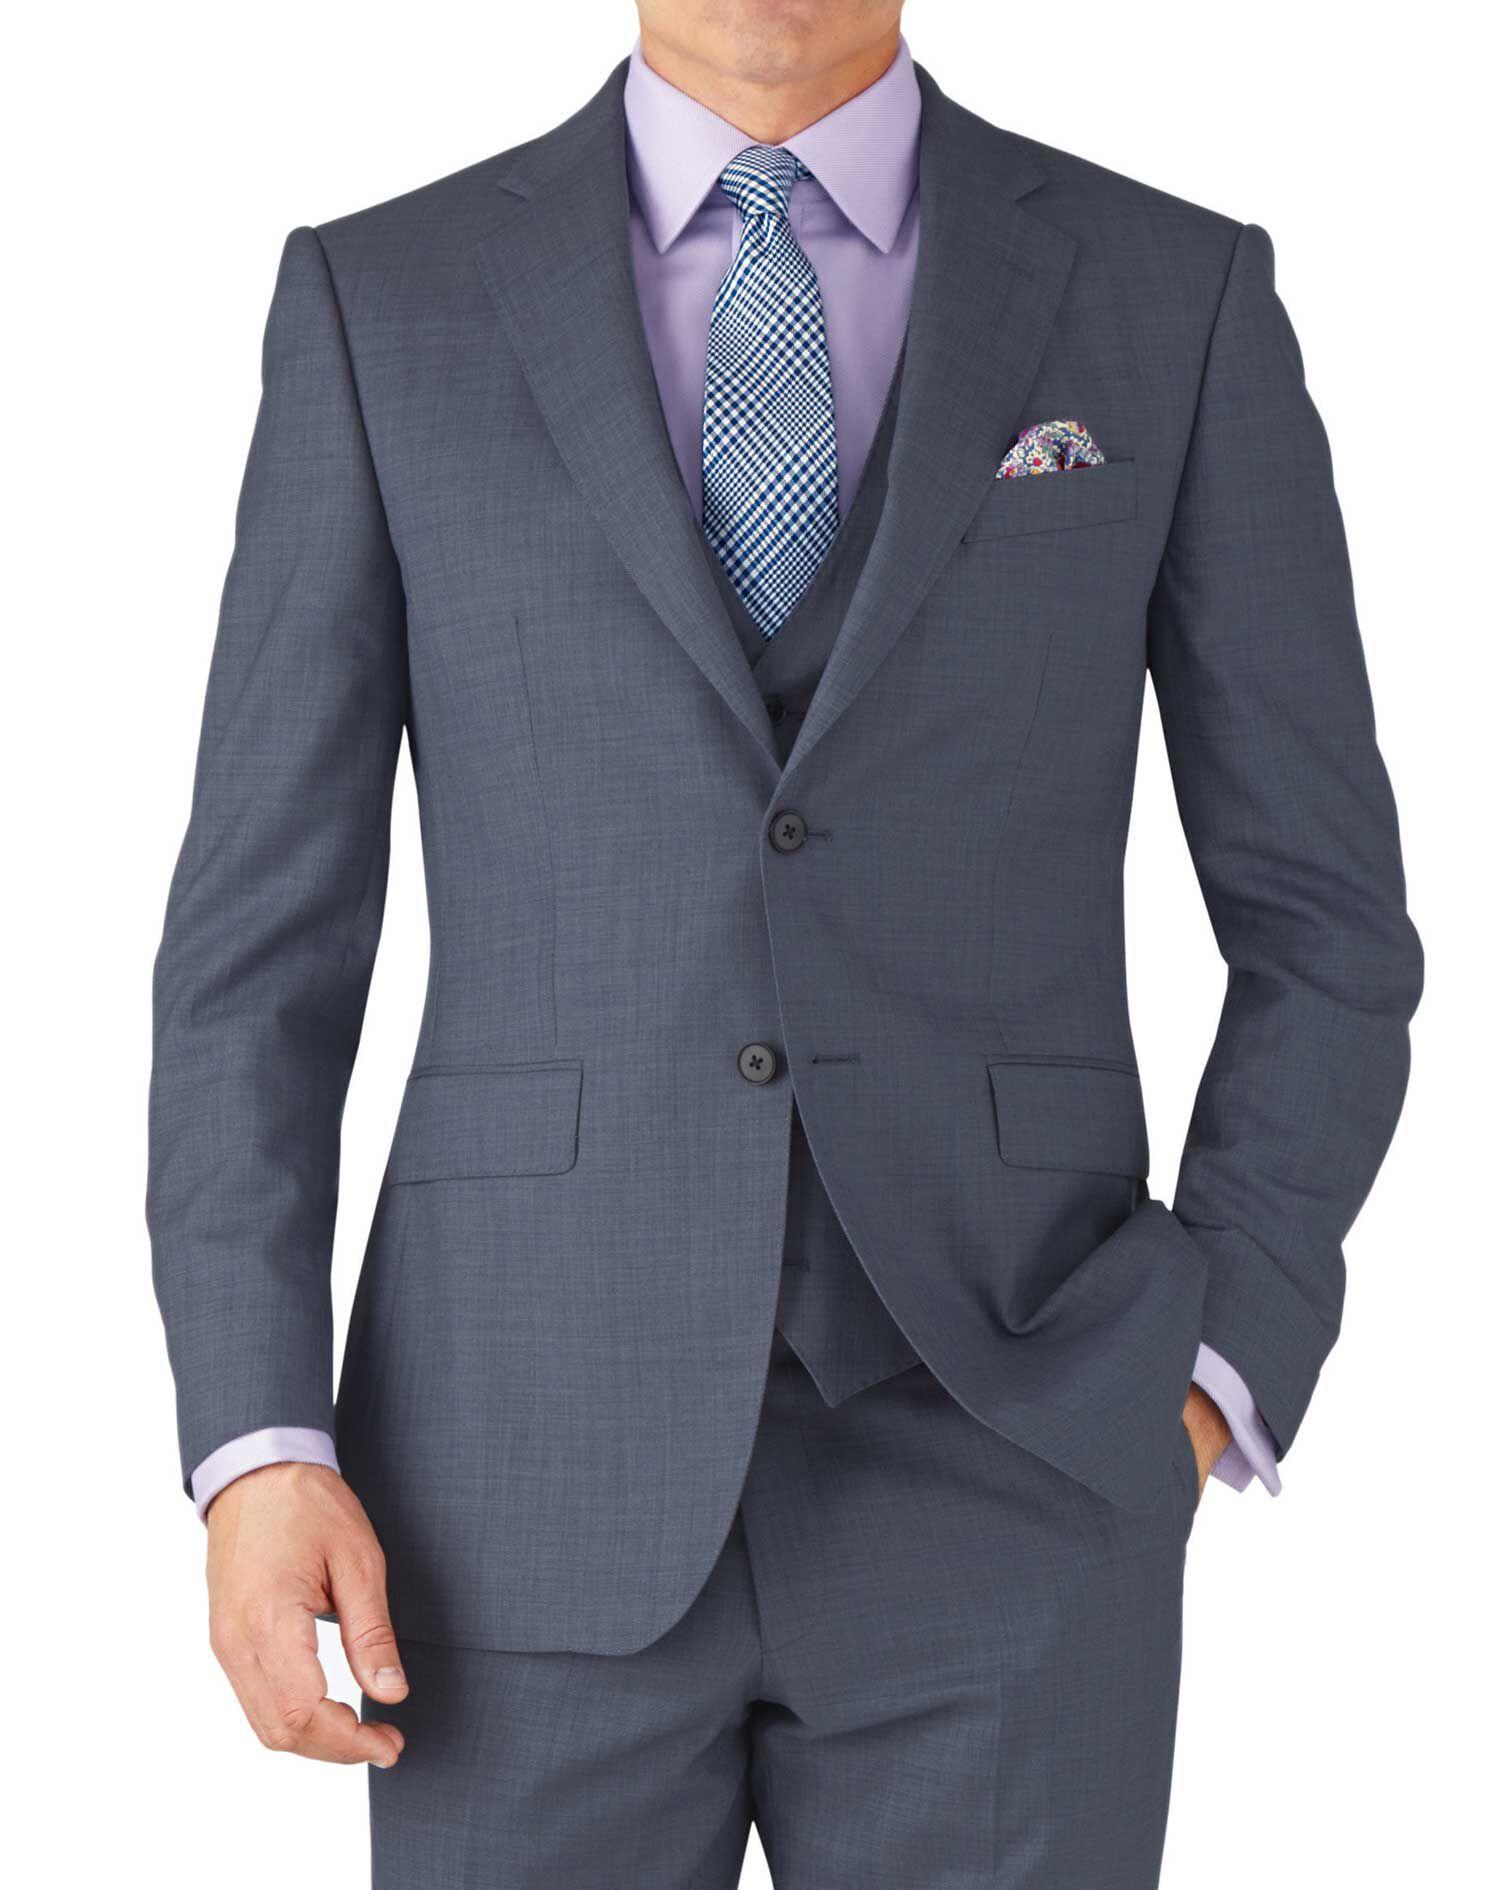 Light Blue Classic Fit Sharkskin Travel Suit Wool Jacket Size 38 Regular by Charles Tyrwhitt